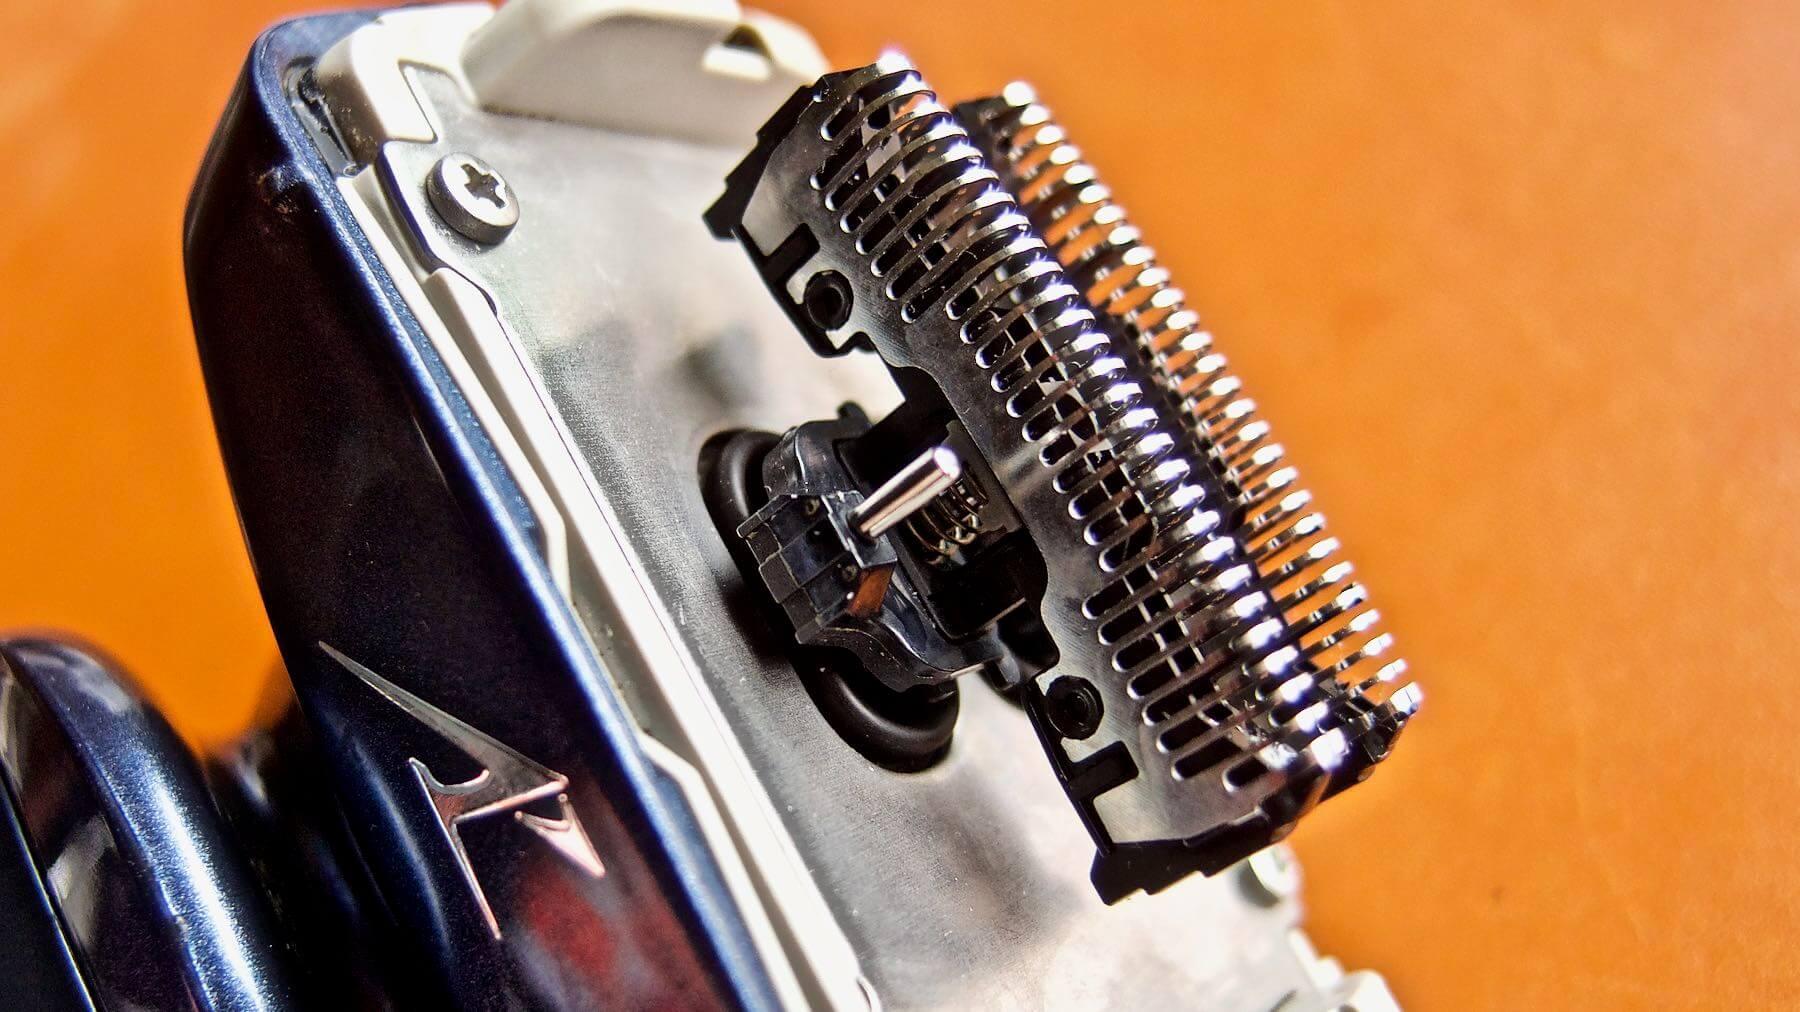 02 LAMDASH ES LV72 Inner blade